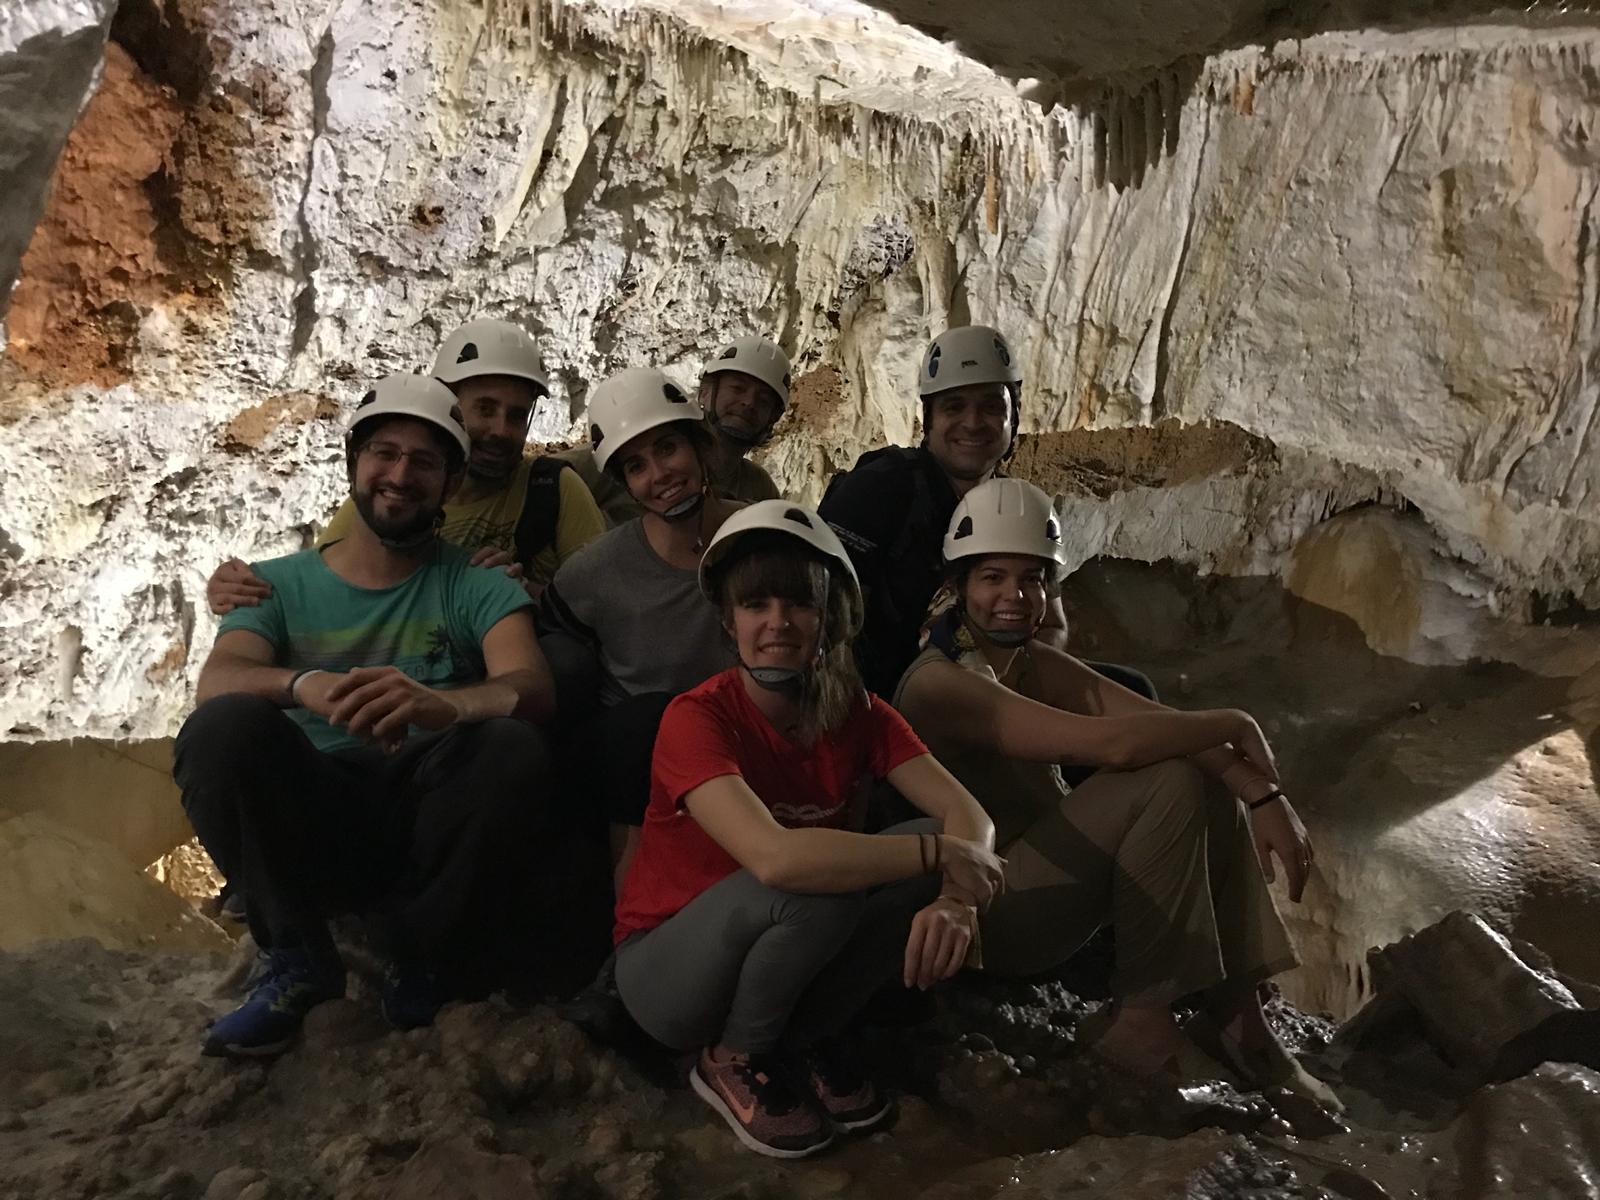 23-jun-2019-blogueros-espaoles-de-viajes-visitan-el-pen_48131067241_o